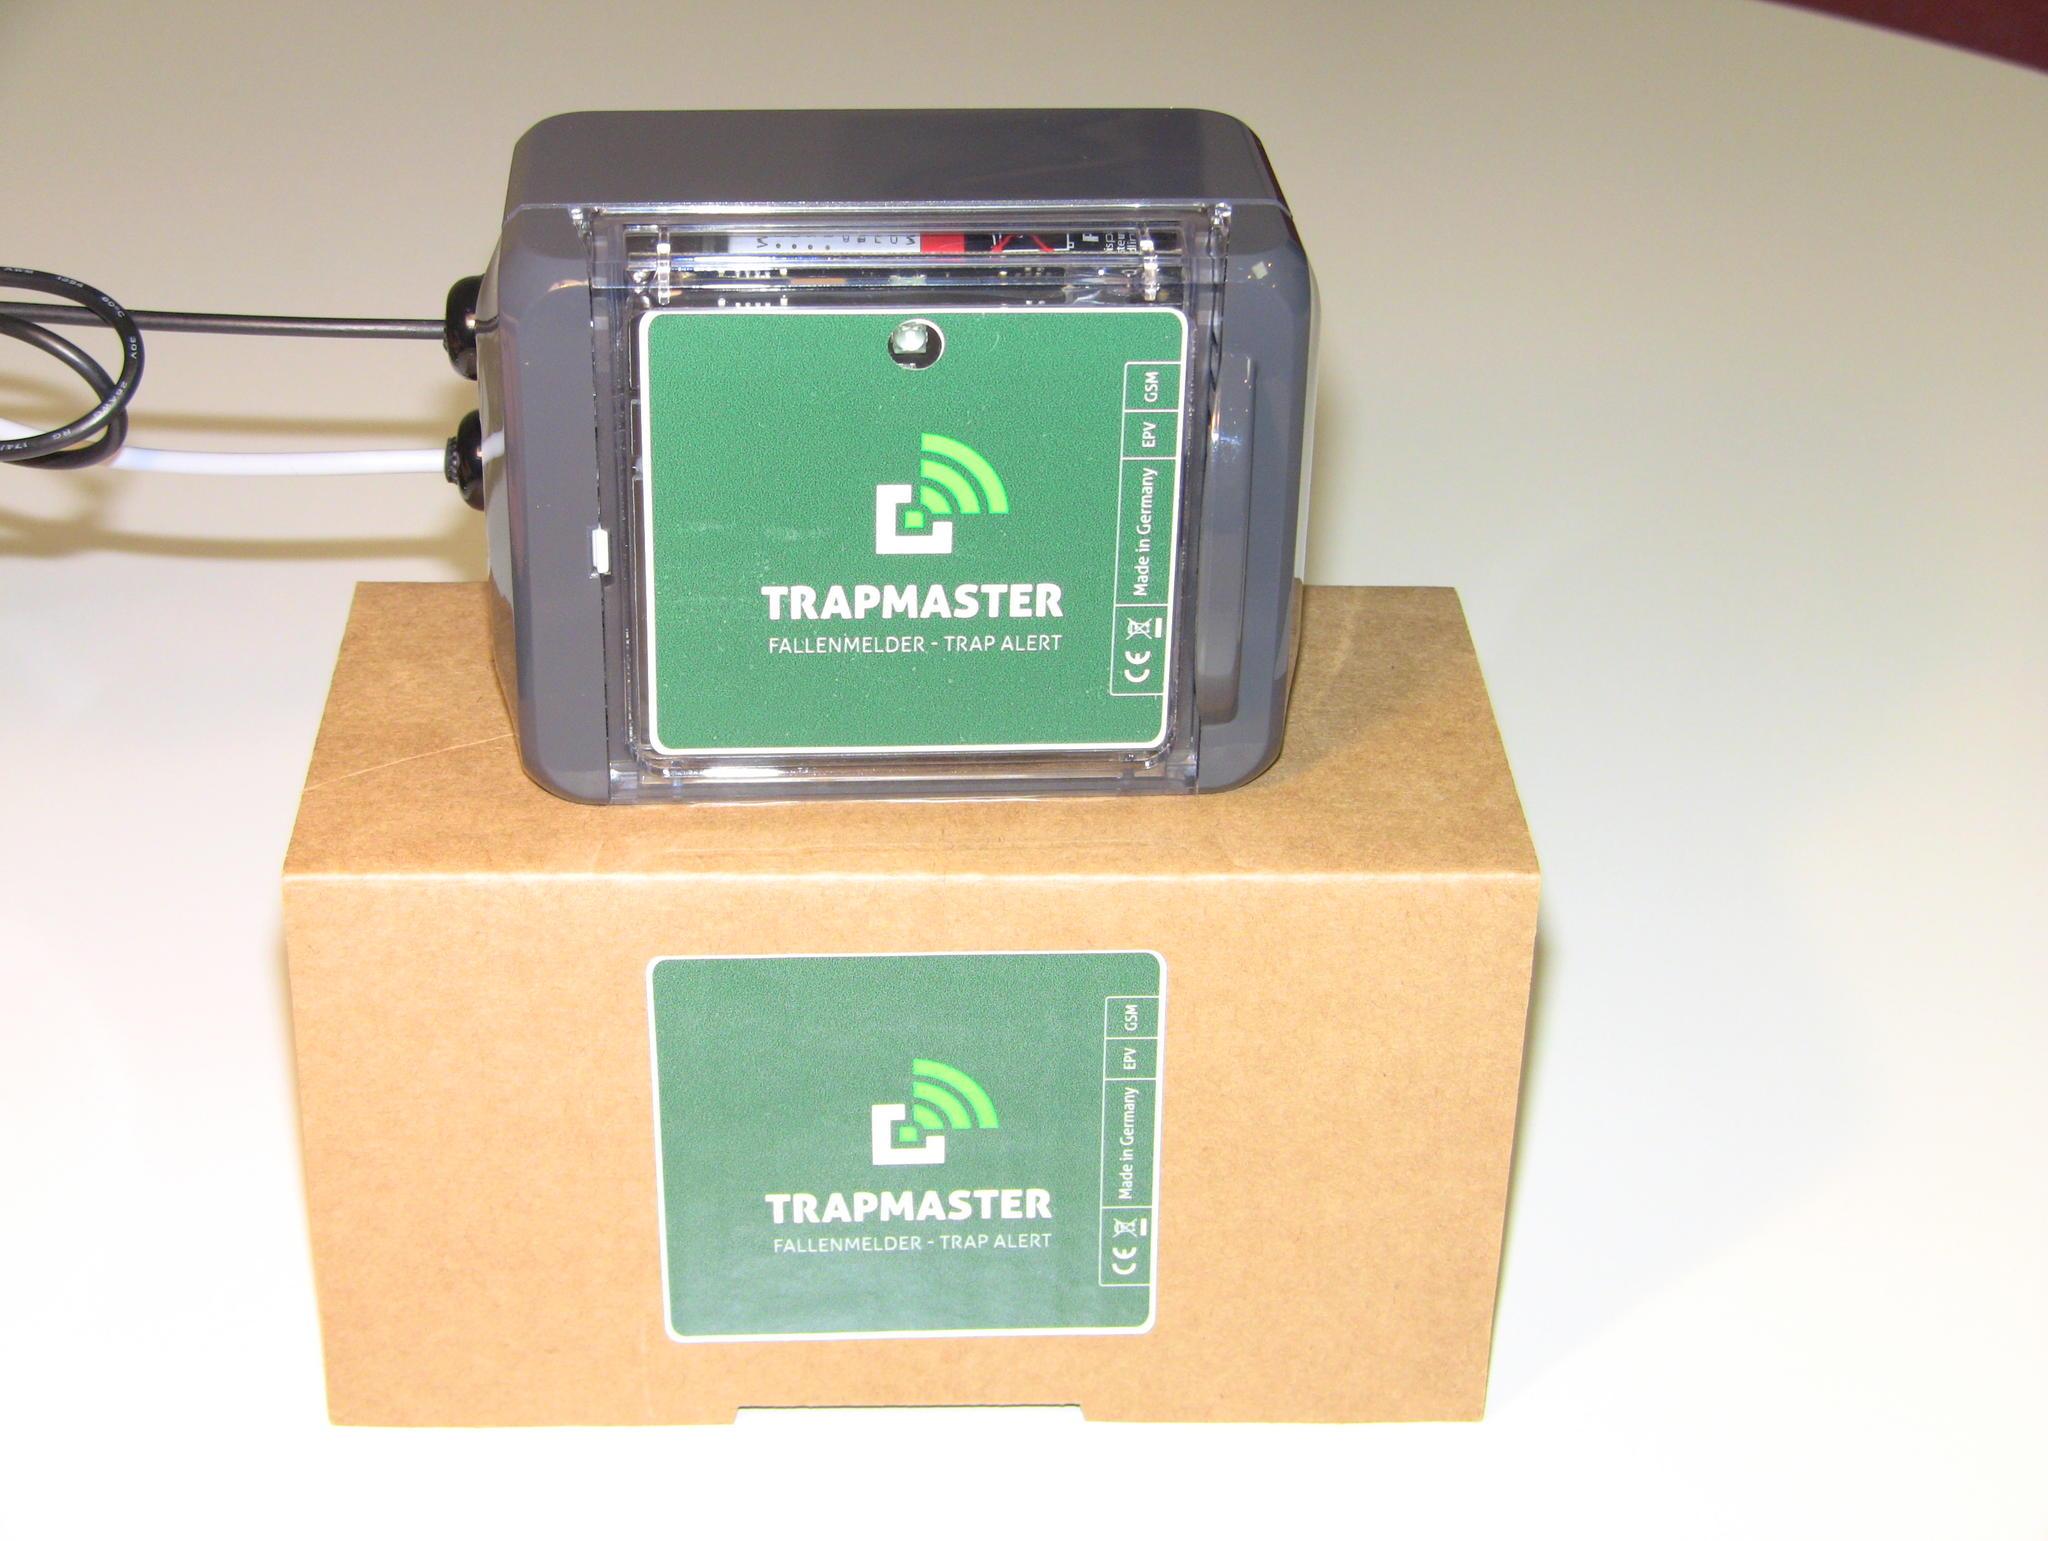 TRAPMASTER trap alert - trap alarm - monitoring system